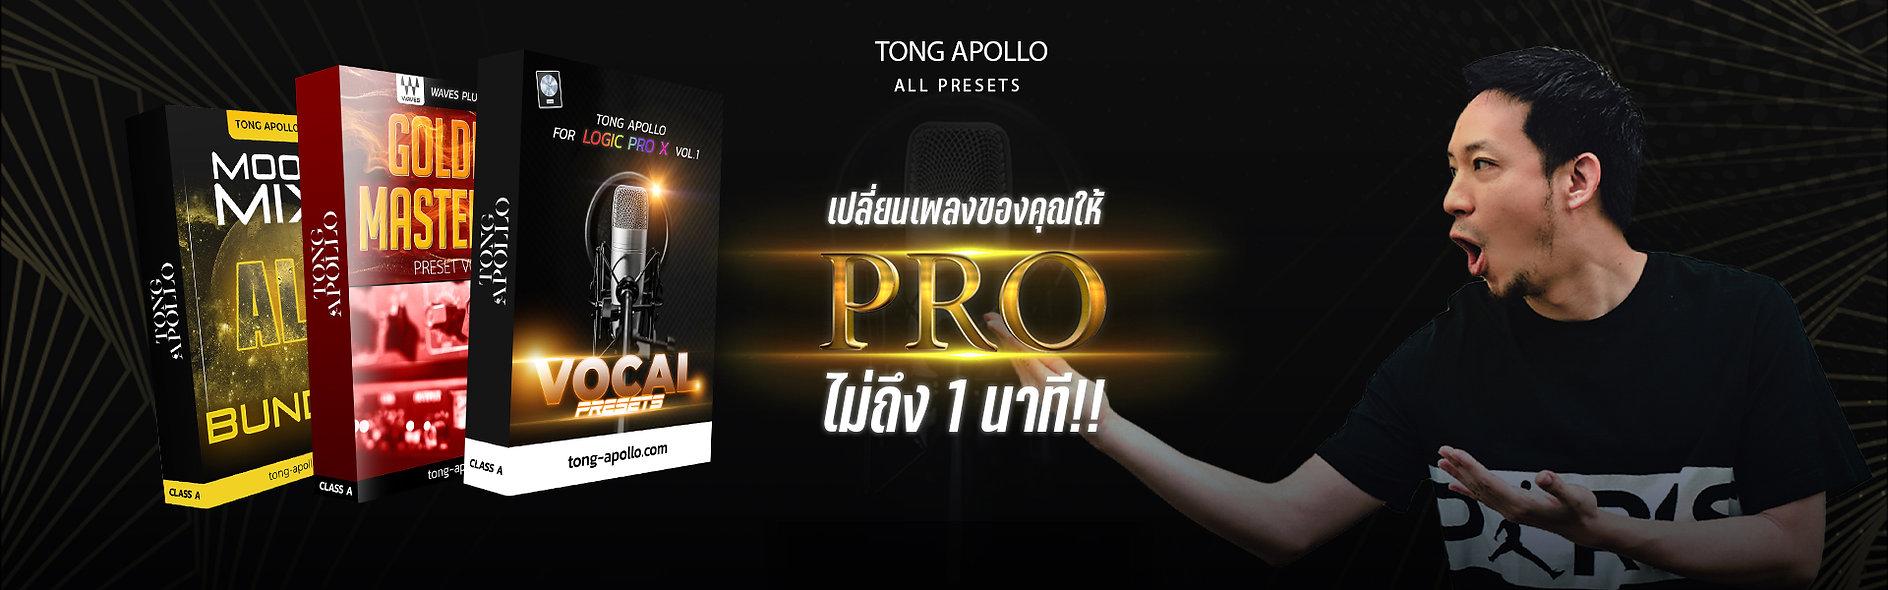 All Tong Apollo Presets with P Tong.jpg